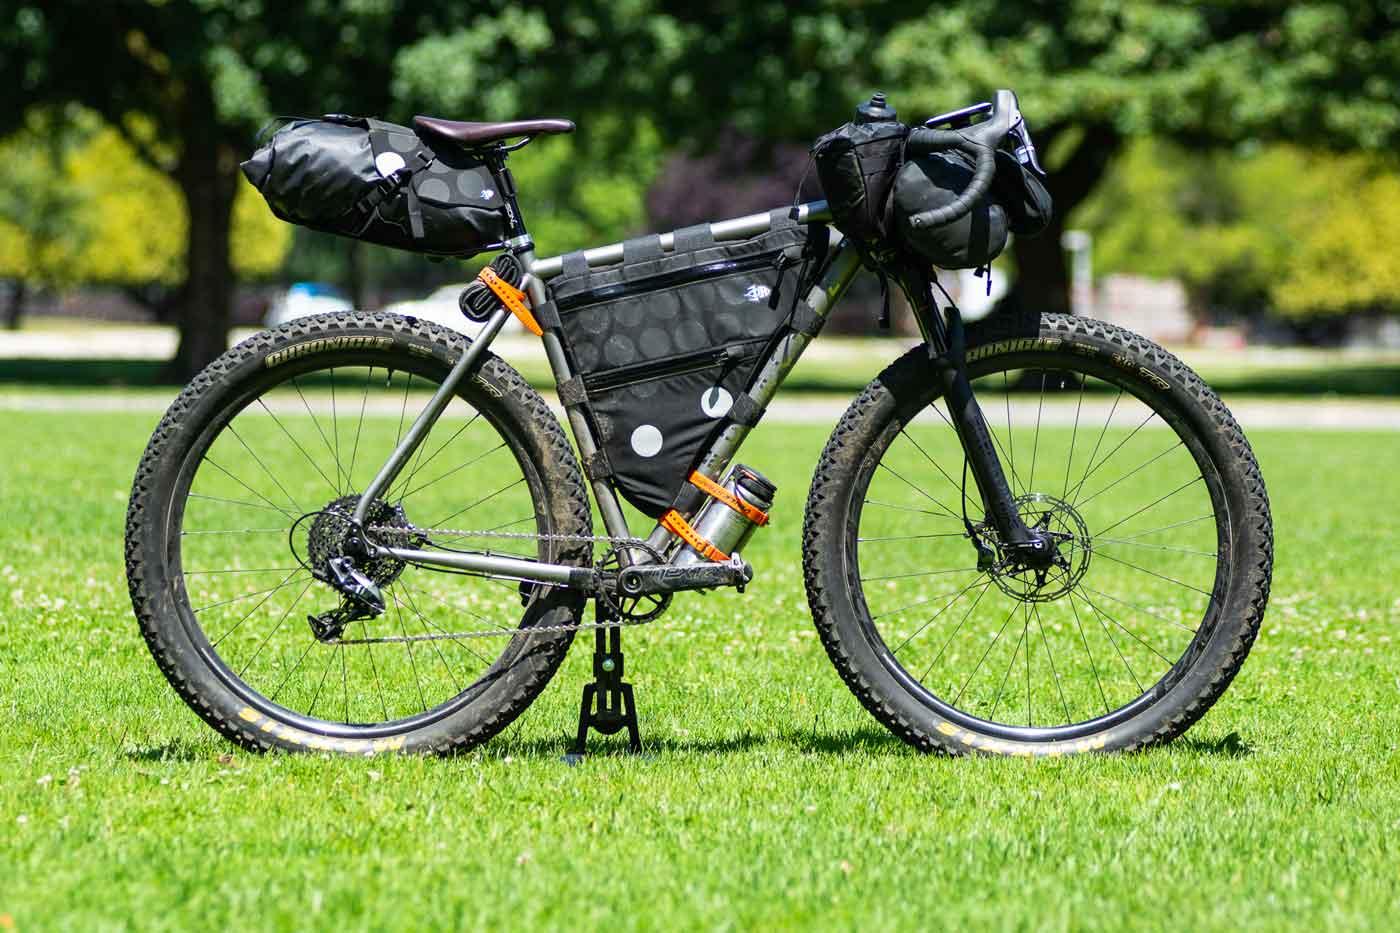 Landyachtz_Frame_Sets_Titanium_Monster_Bikes_George-Monster-Strath2593